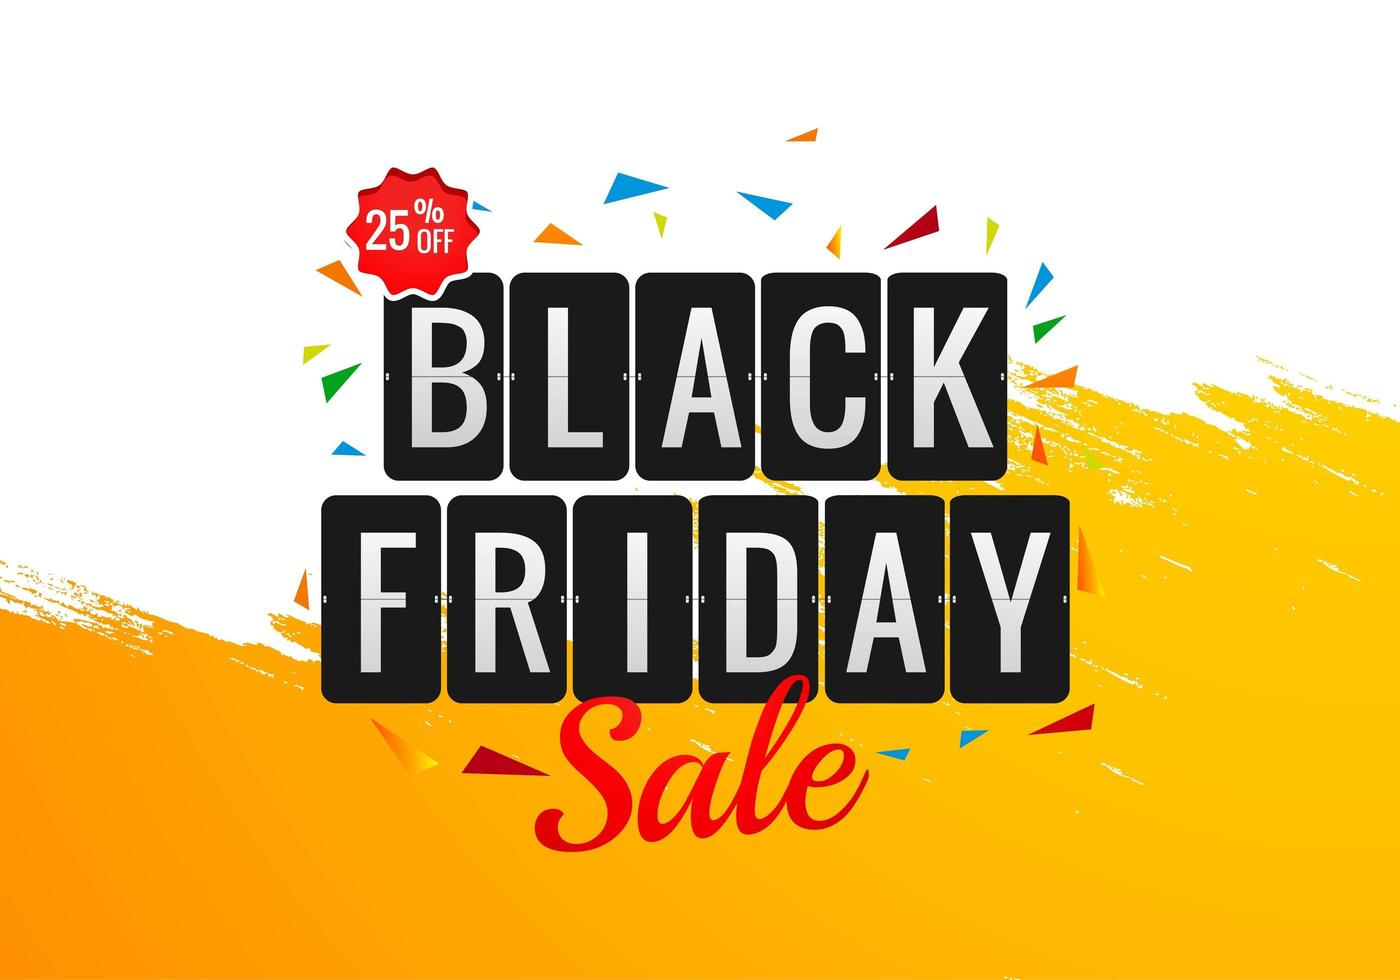 design de modelo de banner de venda de feriado de sexta-feira negra vetor